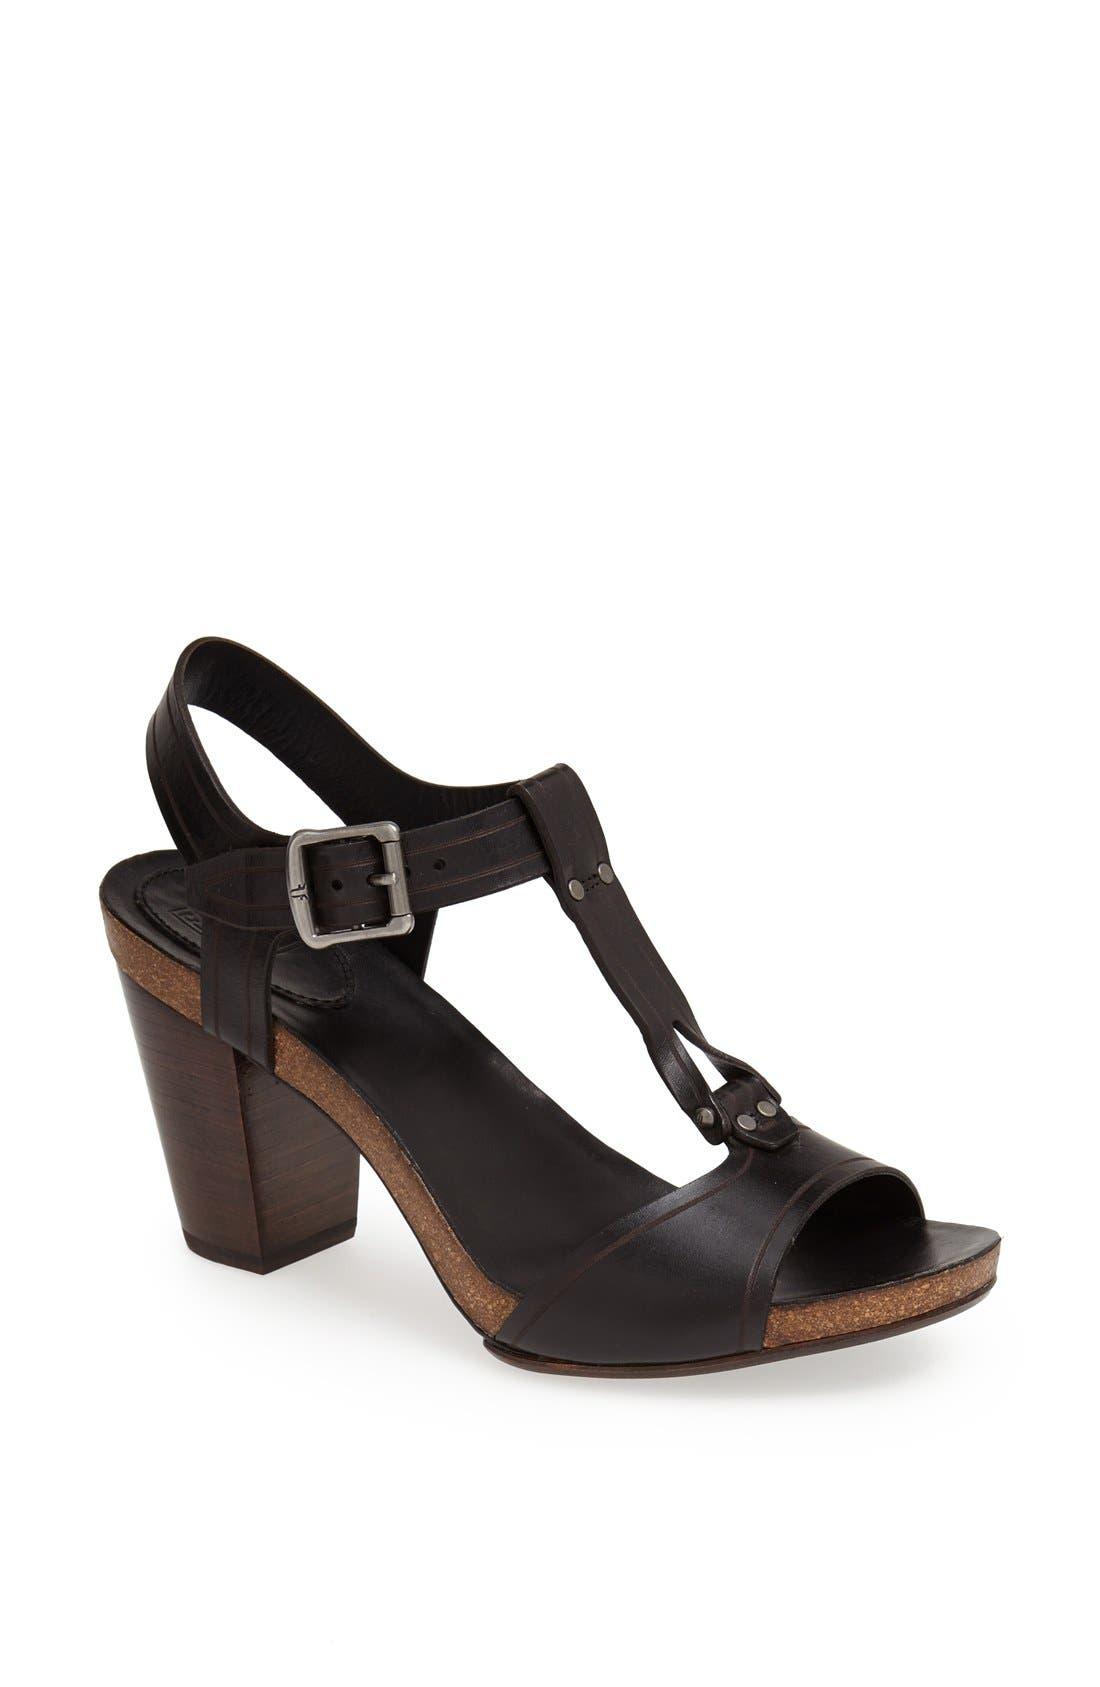 FRYE 'Silvie' Y-Strap Leather Sandal, Main, color, 001